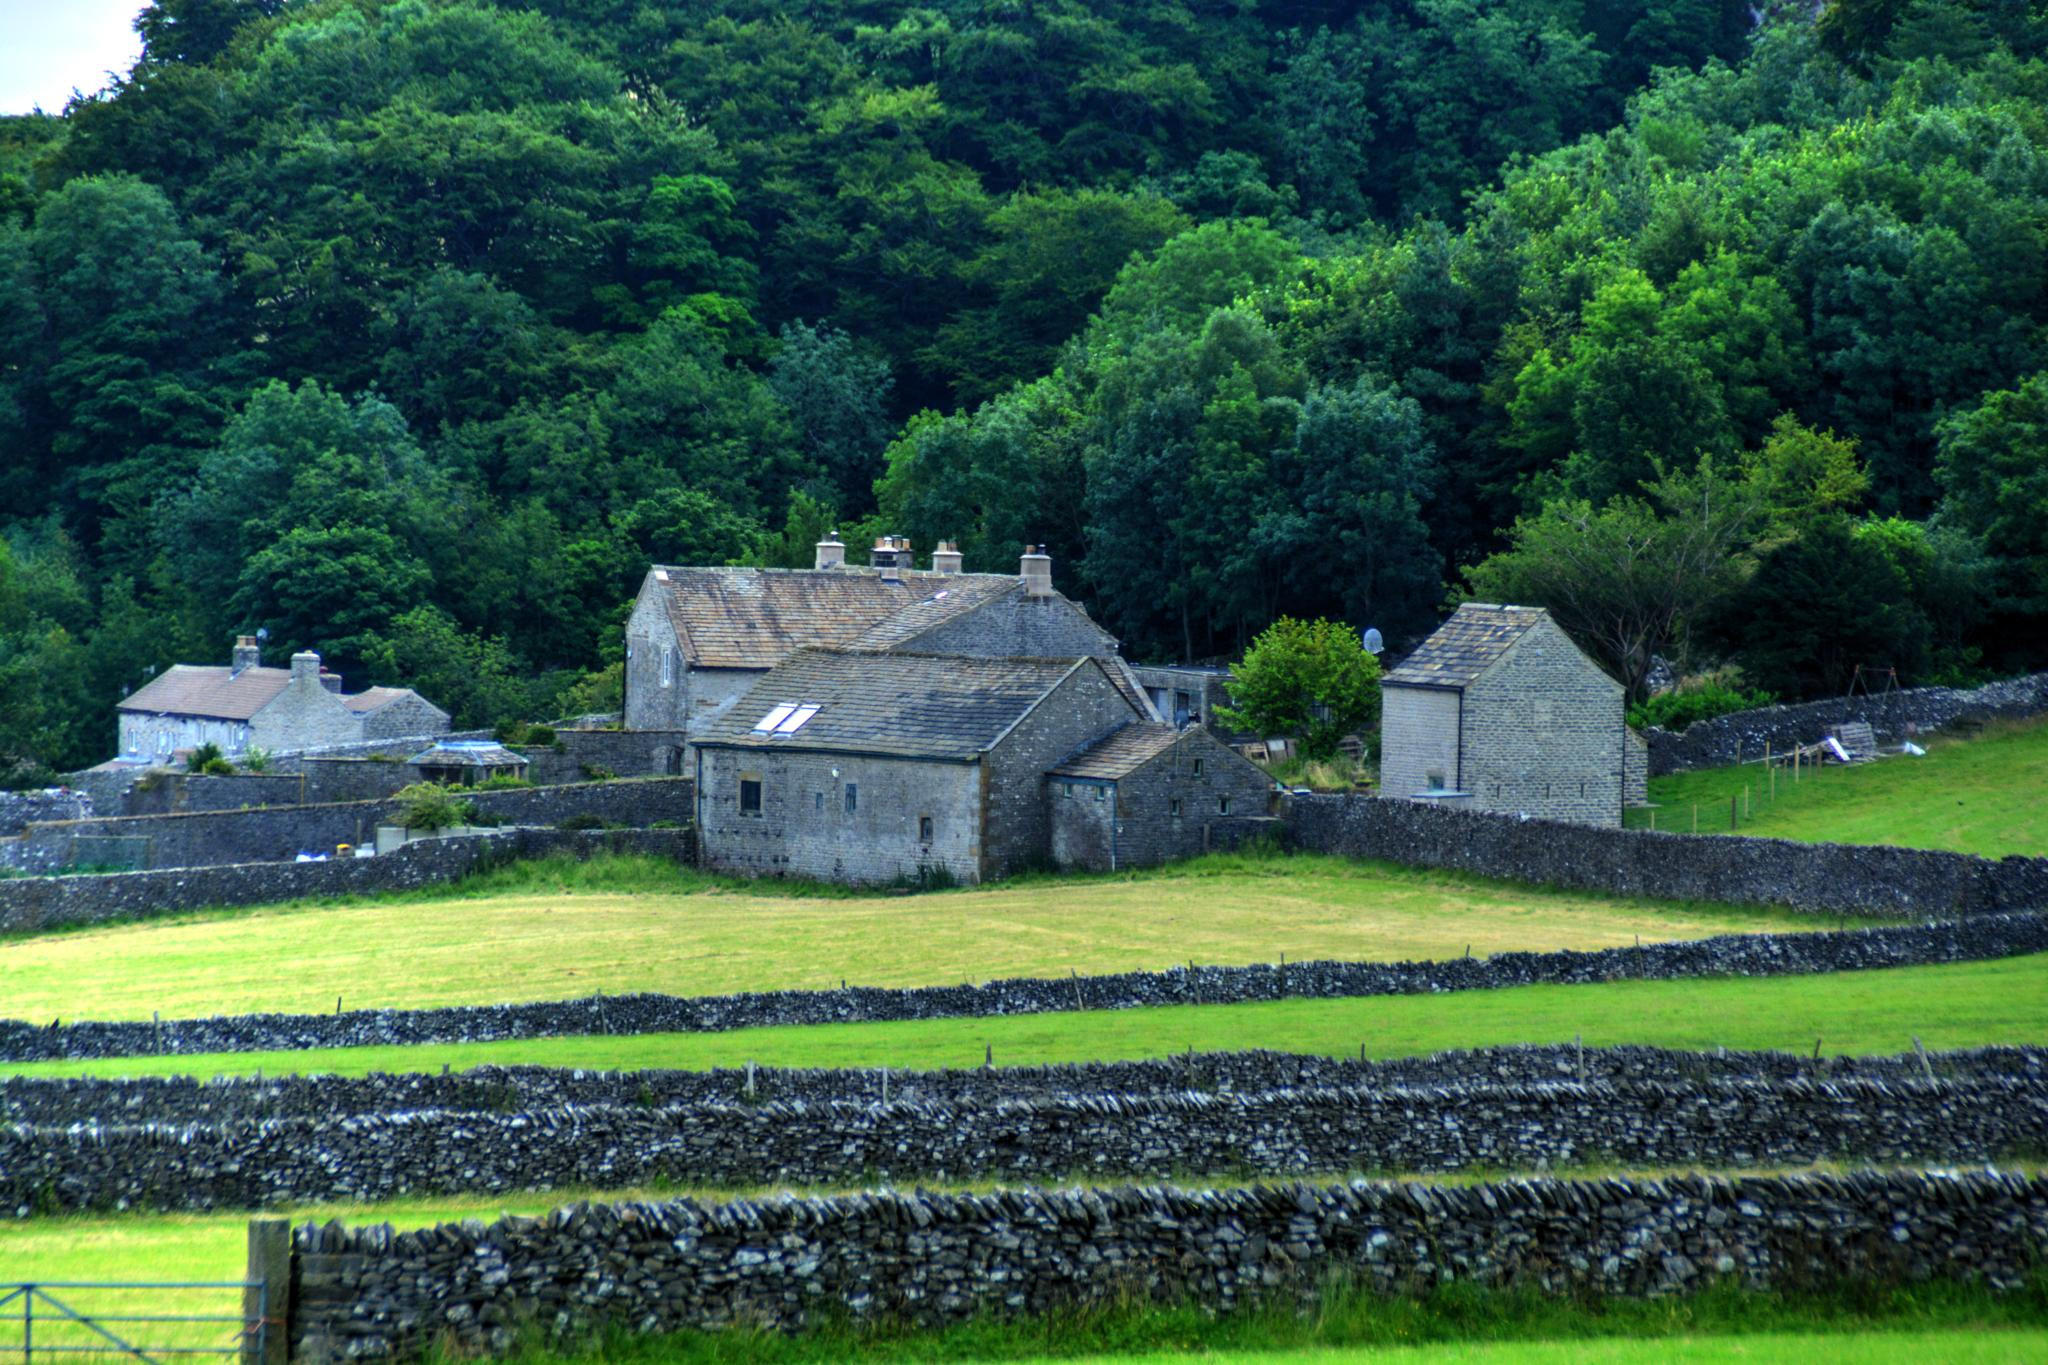 castleton derbyshire by Stuart Robertshaw Photography